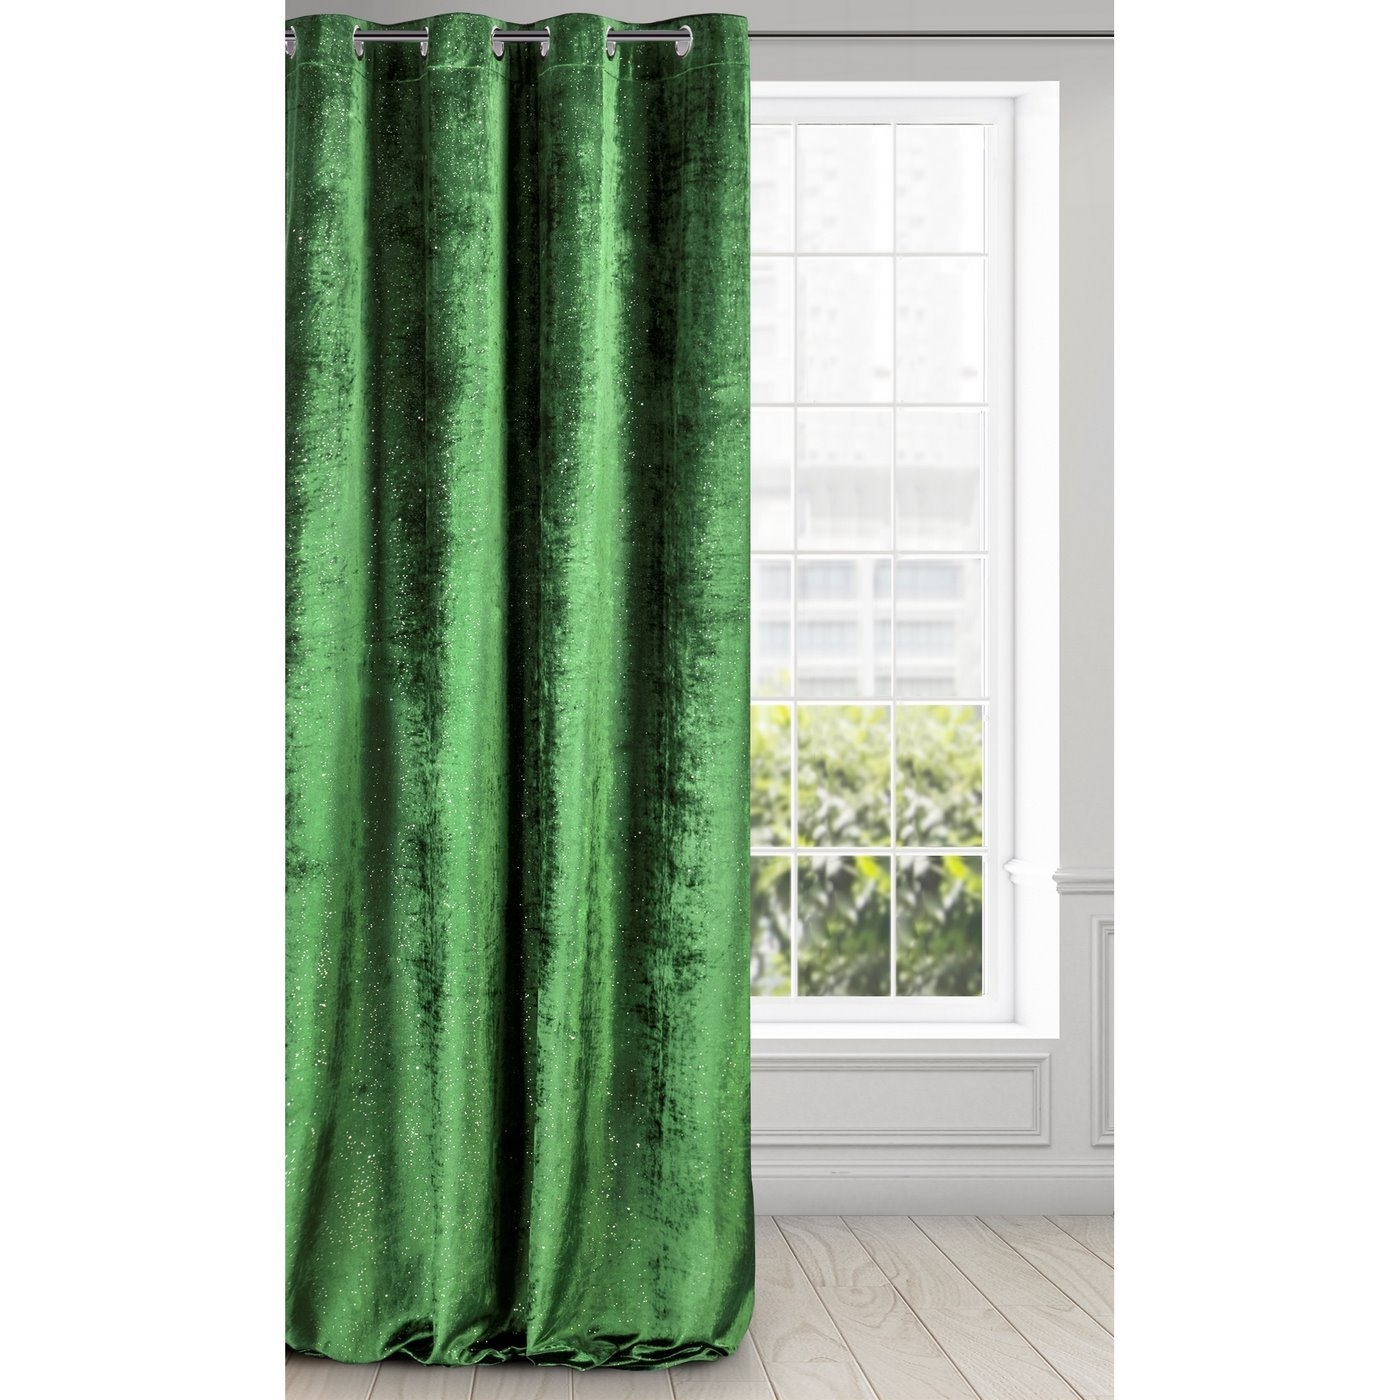 Draperie Elizia Velvet Verde, 140 x 250 cm, 1 bucata imagine